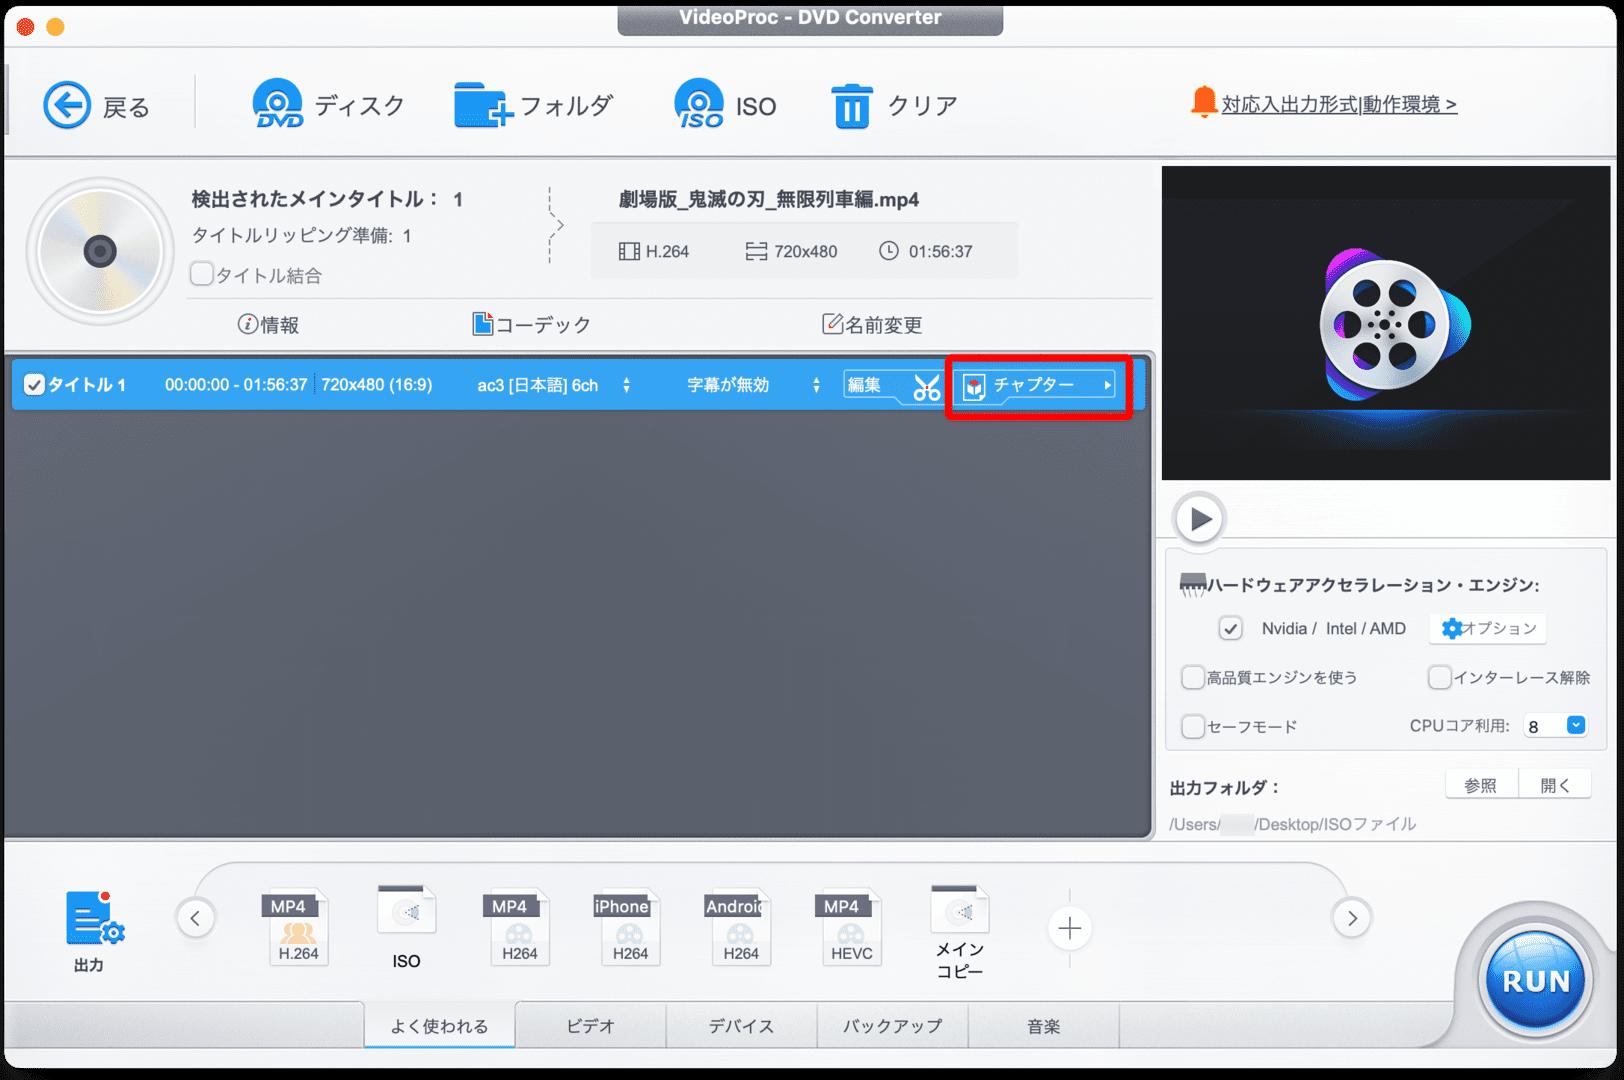 【DVDをiPhoneにコピーして観る】DVDリッピング~データ変換・スマホに取り込む方法|コピーガード解除、MP4・ISOのパソコン保存もVideoProcなら簡単!|DVDデータをmp4形式に変換する:処理したい動画データを選択する:仮に本編の特定部分だけを動画データ化させたい場合は、自動選択されたタイトルの並びにある「チャプター」をクリックして特定のチャプターだけにチェックを入れましょう。